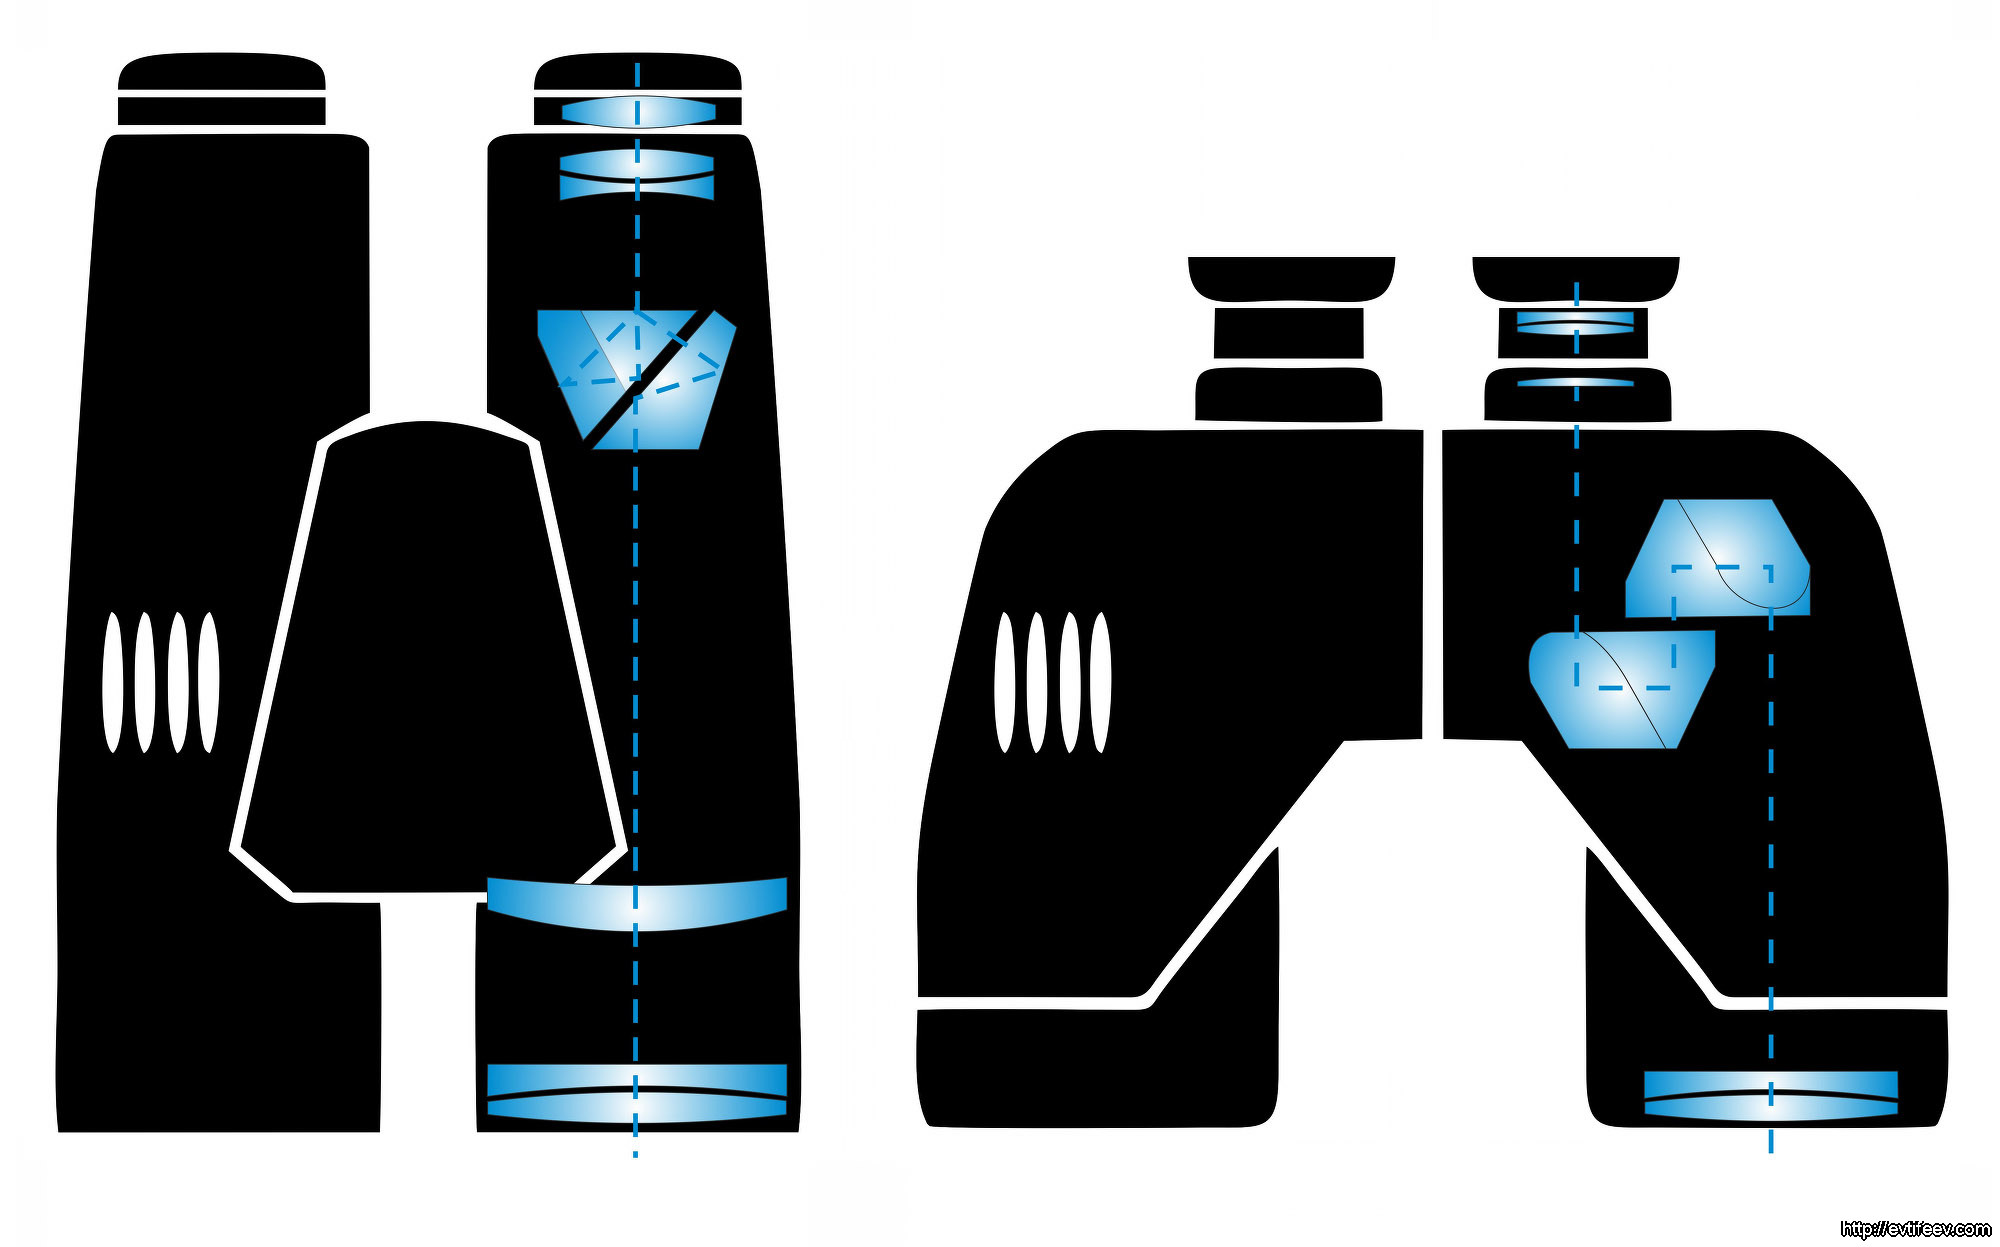 Обзор и тест бинокля STEINER SKYHAWK 3.0 8x42